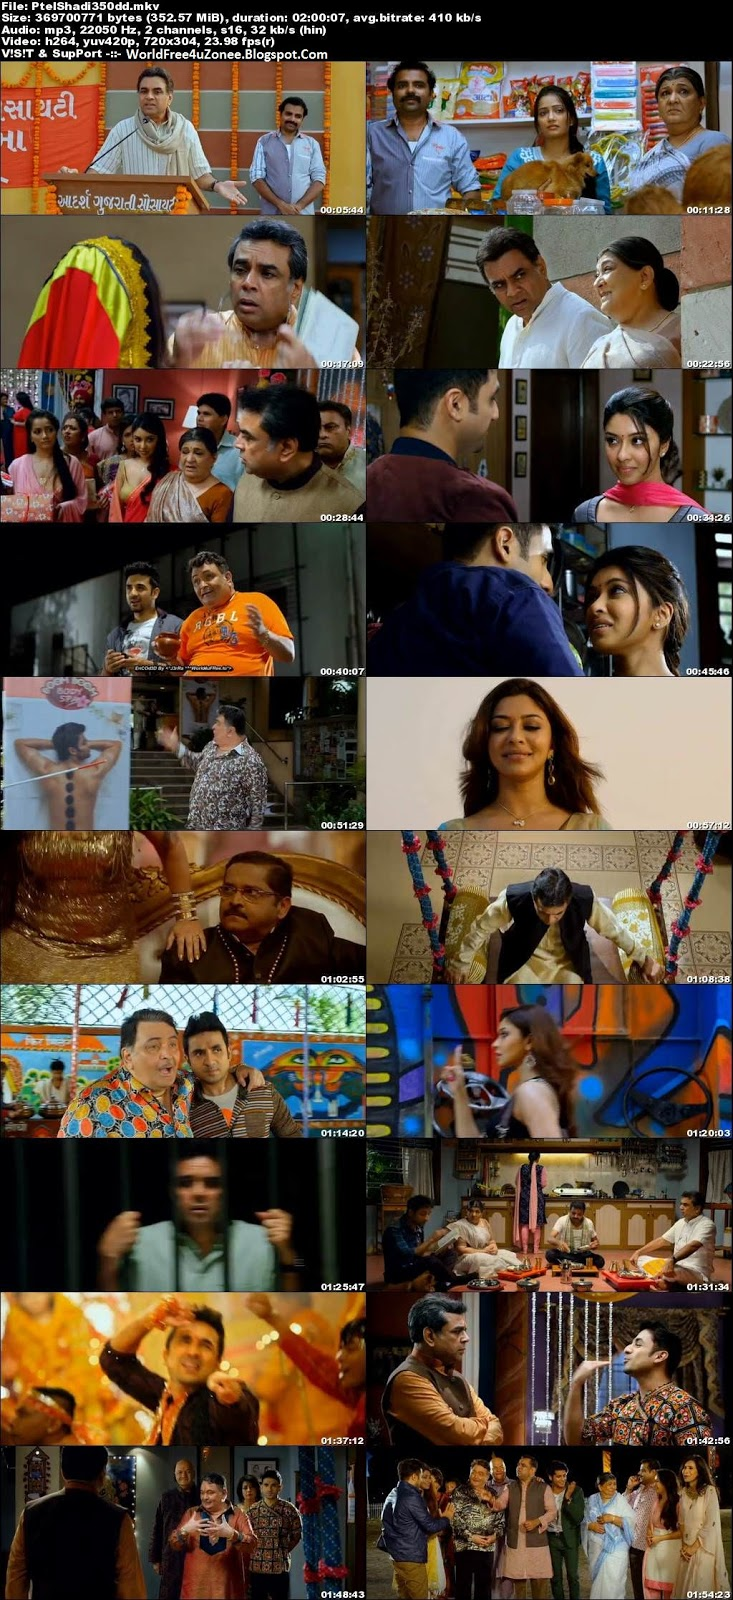 Patel Ki Punjabi Shaadi (2017) Hindi DVDRip 480p 300MB Full Movie Free Download And Watch Online Latest Bollywood Hindi Movies 2017 Free At WorldFree4uZonee.Blogspot.Com